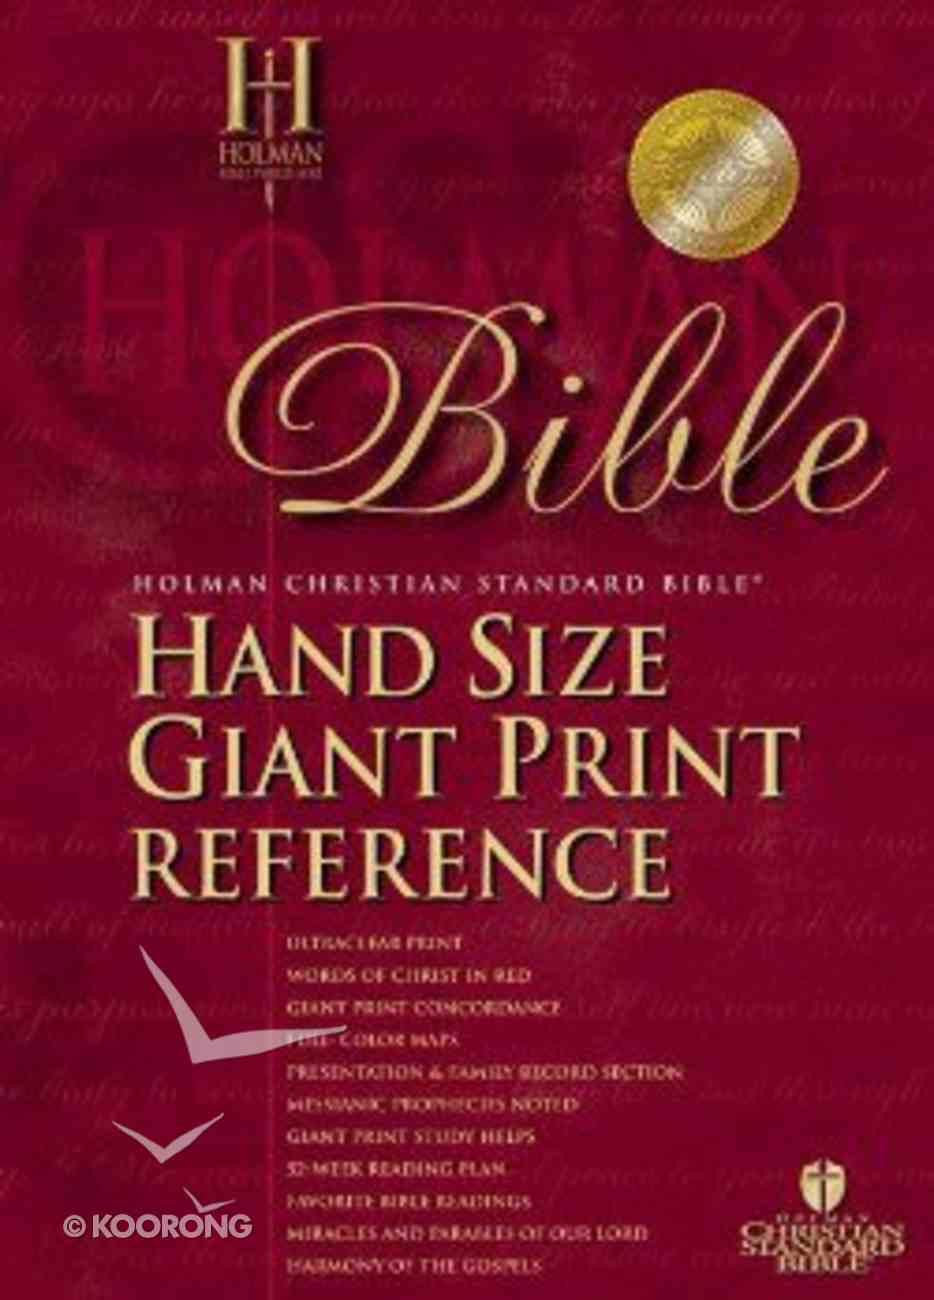 HCSB Hand Size Giant Print Reference Burgundy Indexed Imitation Leather